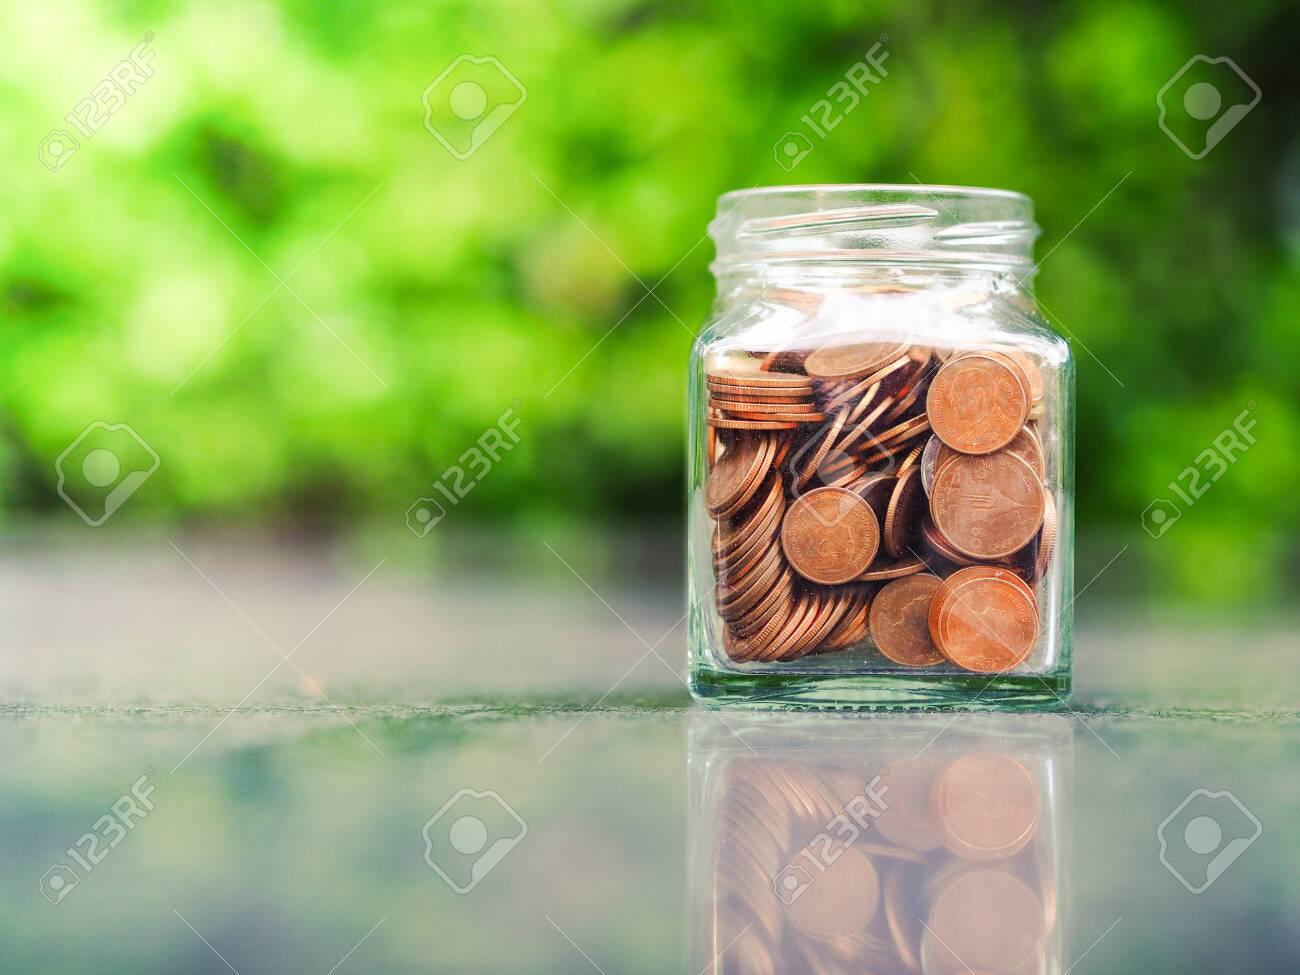 Saving Money for prepare in the future. Saving money concept. - 133804722